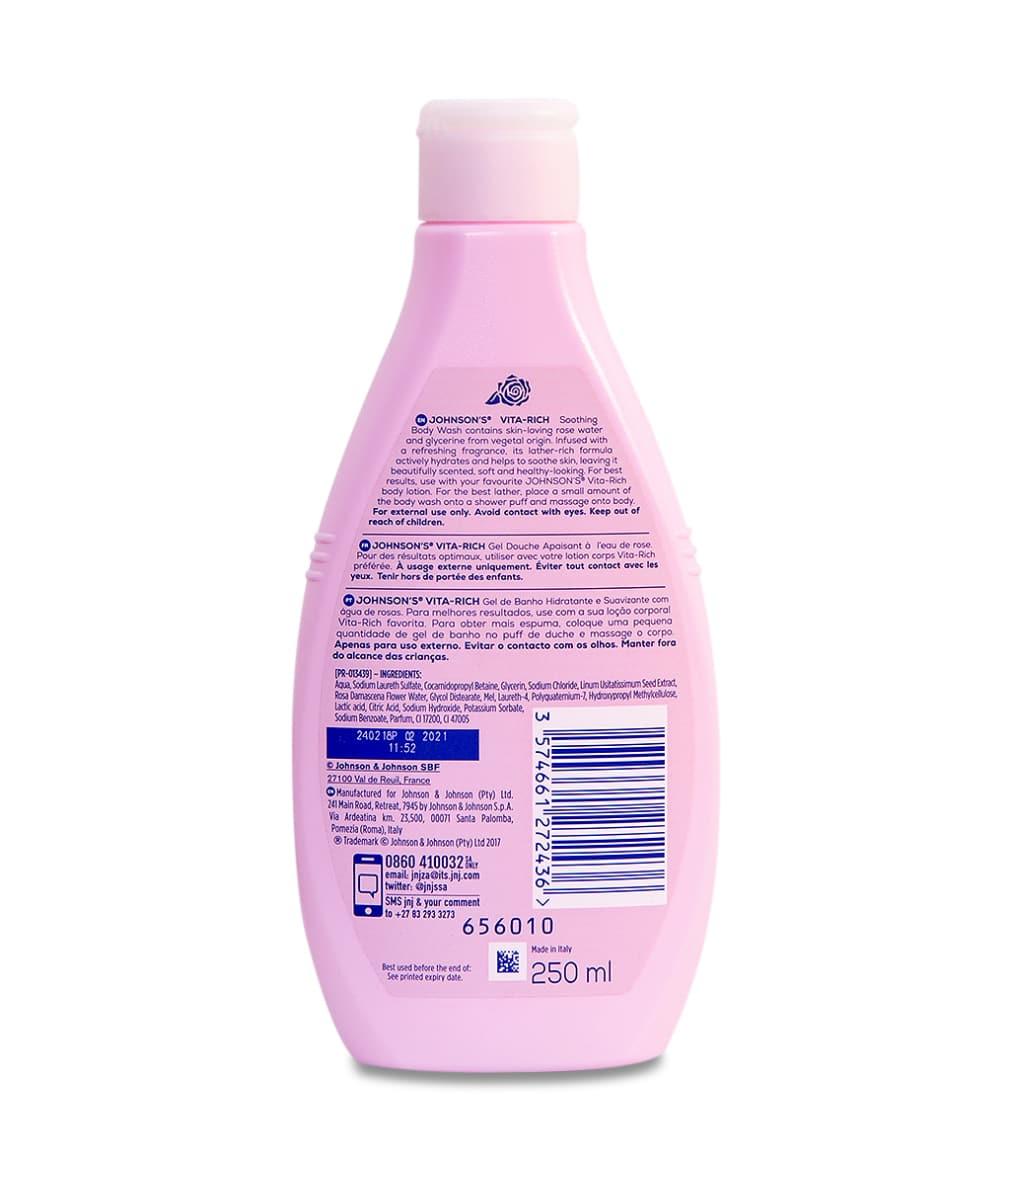 Johnson's Vita-Rich Soothing Rose Water Body Wash 250ml - Kasha